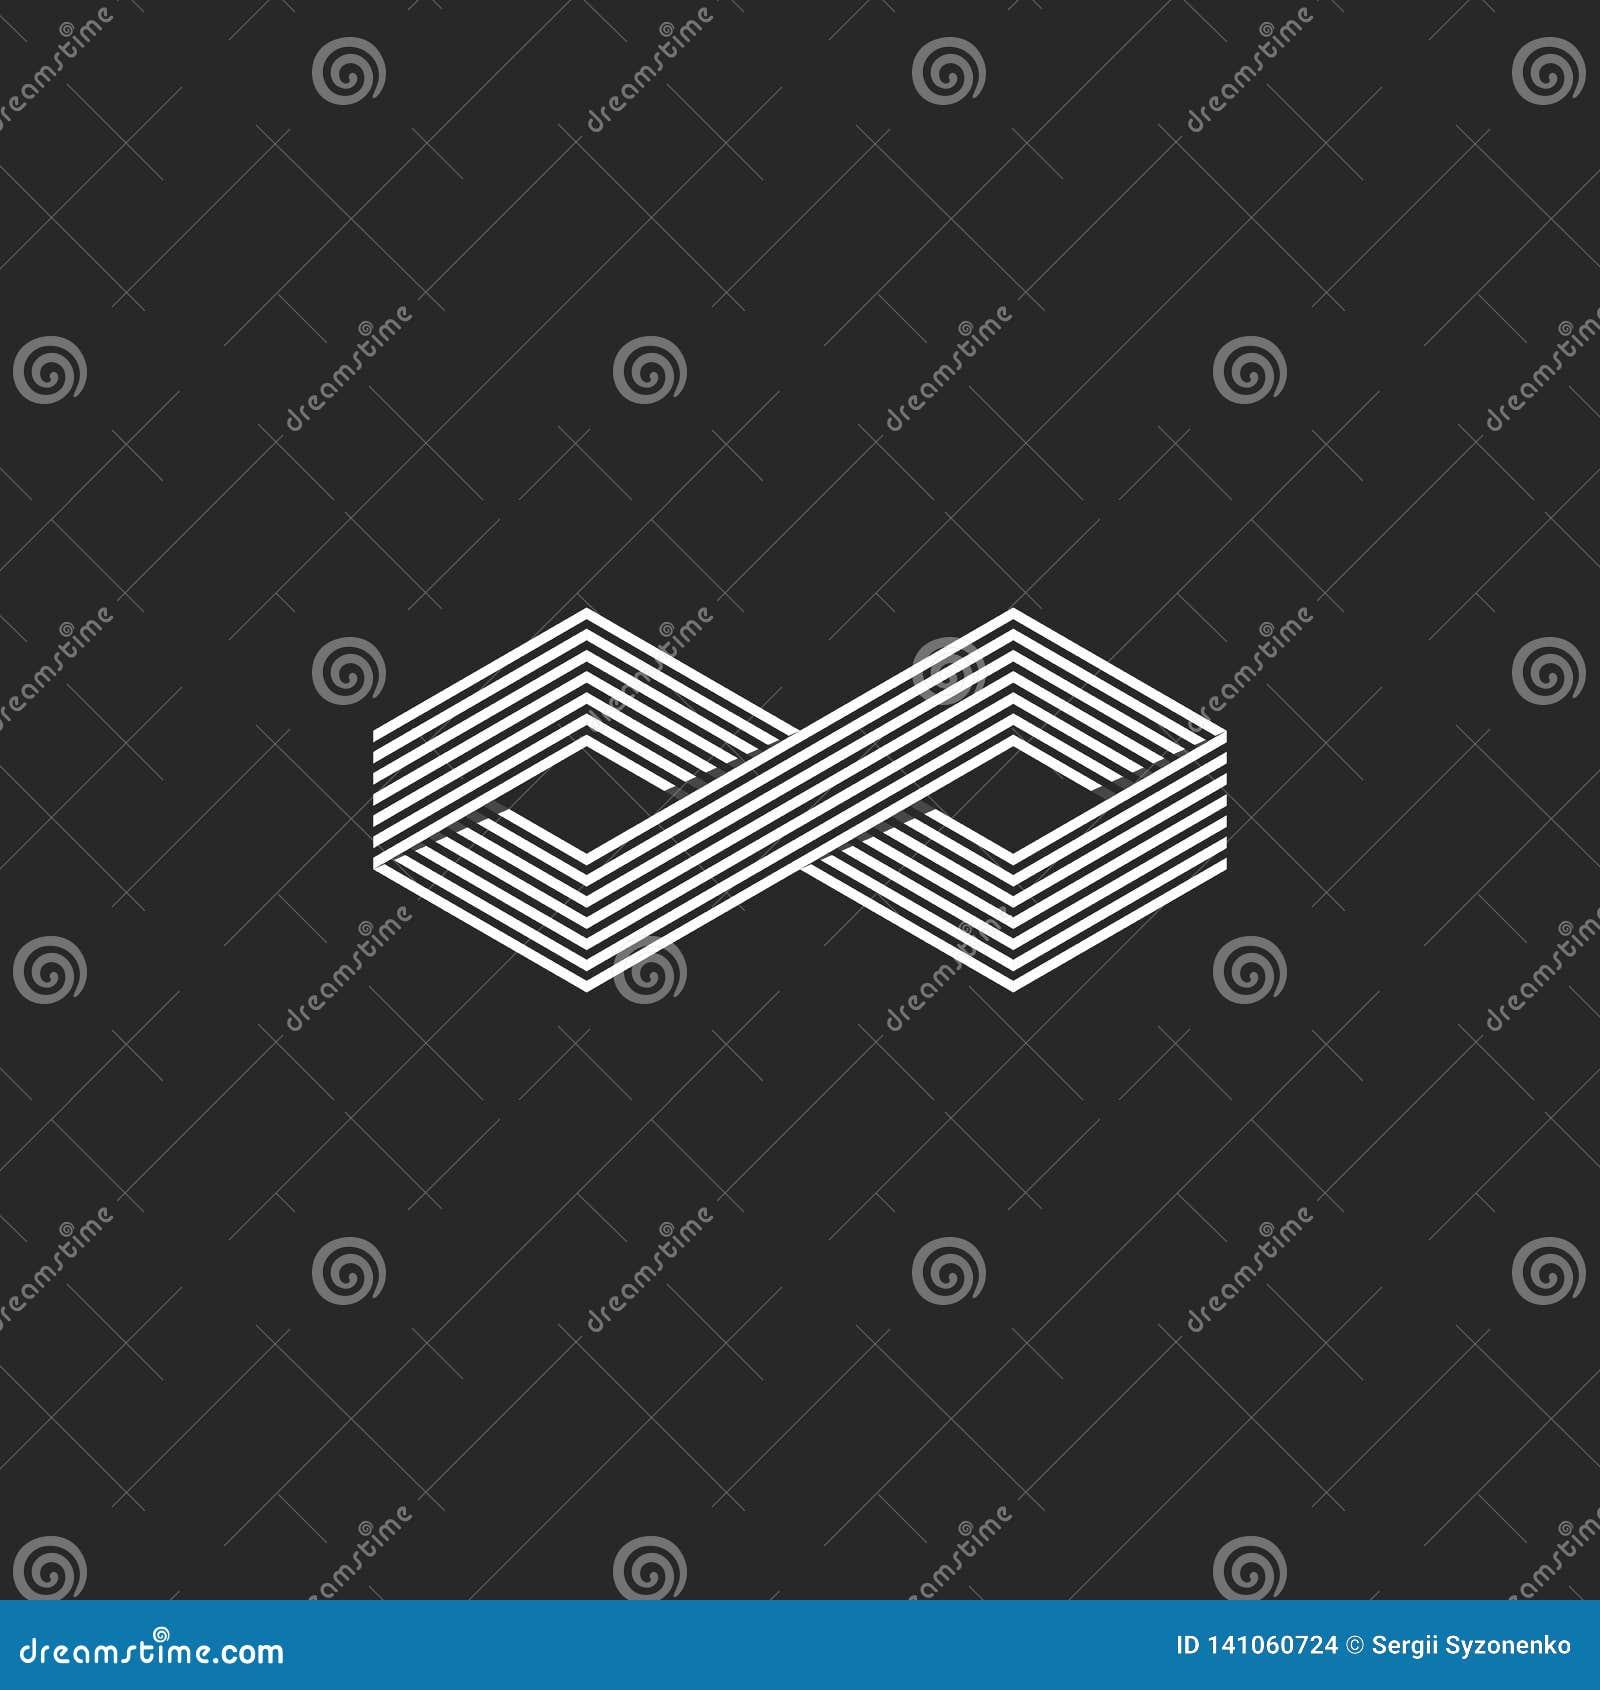 Isometric άπειρο σύμβολο λογότυπων δύο κύβων, γεωμετρική μορφή απείρου που επικαλύπτει το γραμμικό στοιχείο σχεδίου, hipster μονό